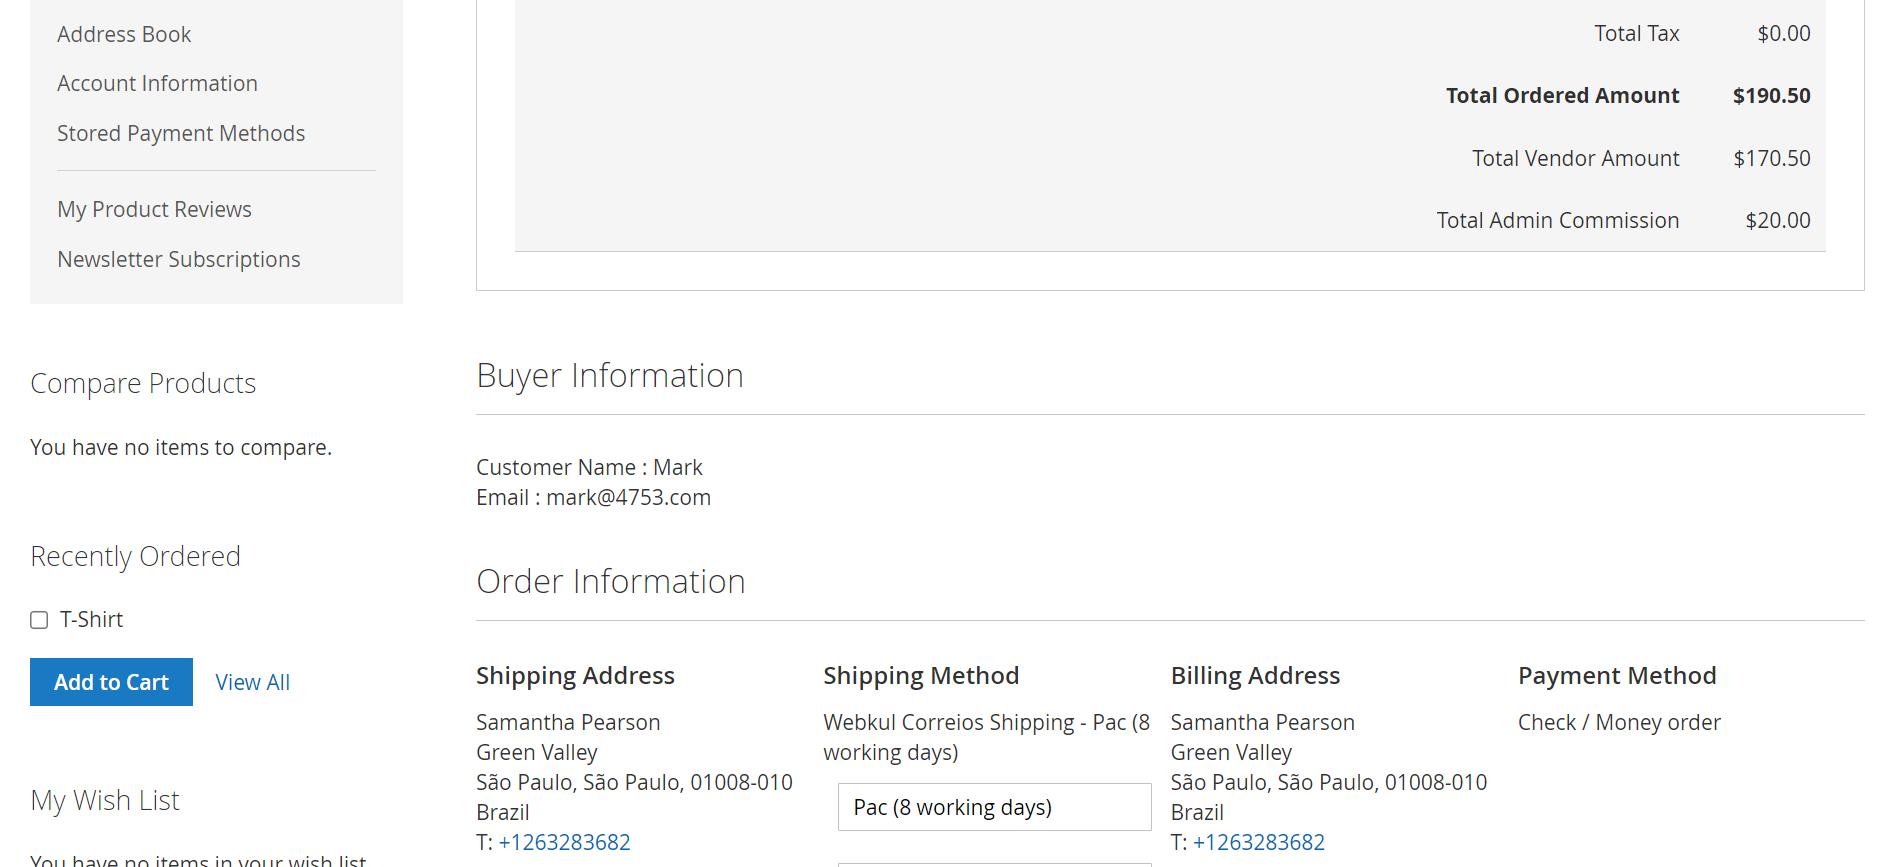 correios-shipping-seller-end-order-details-0